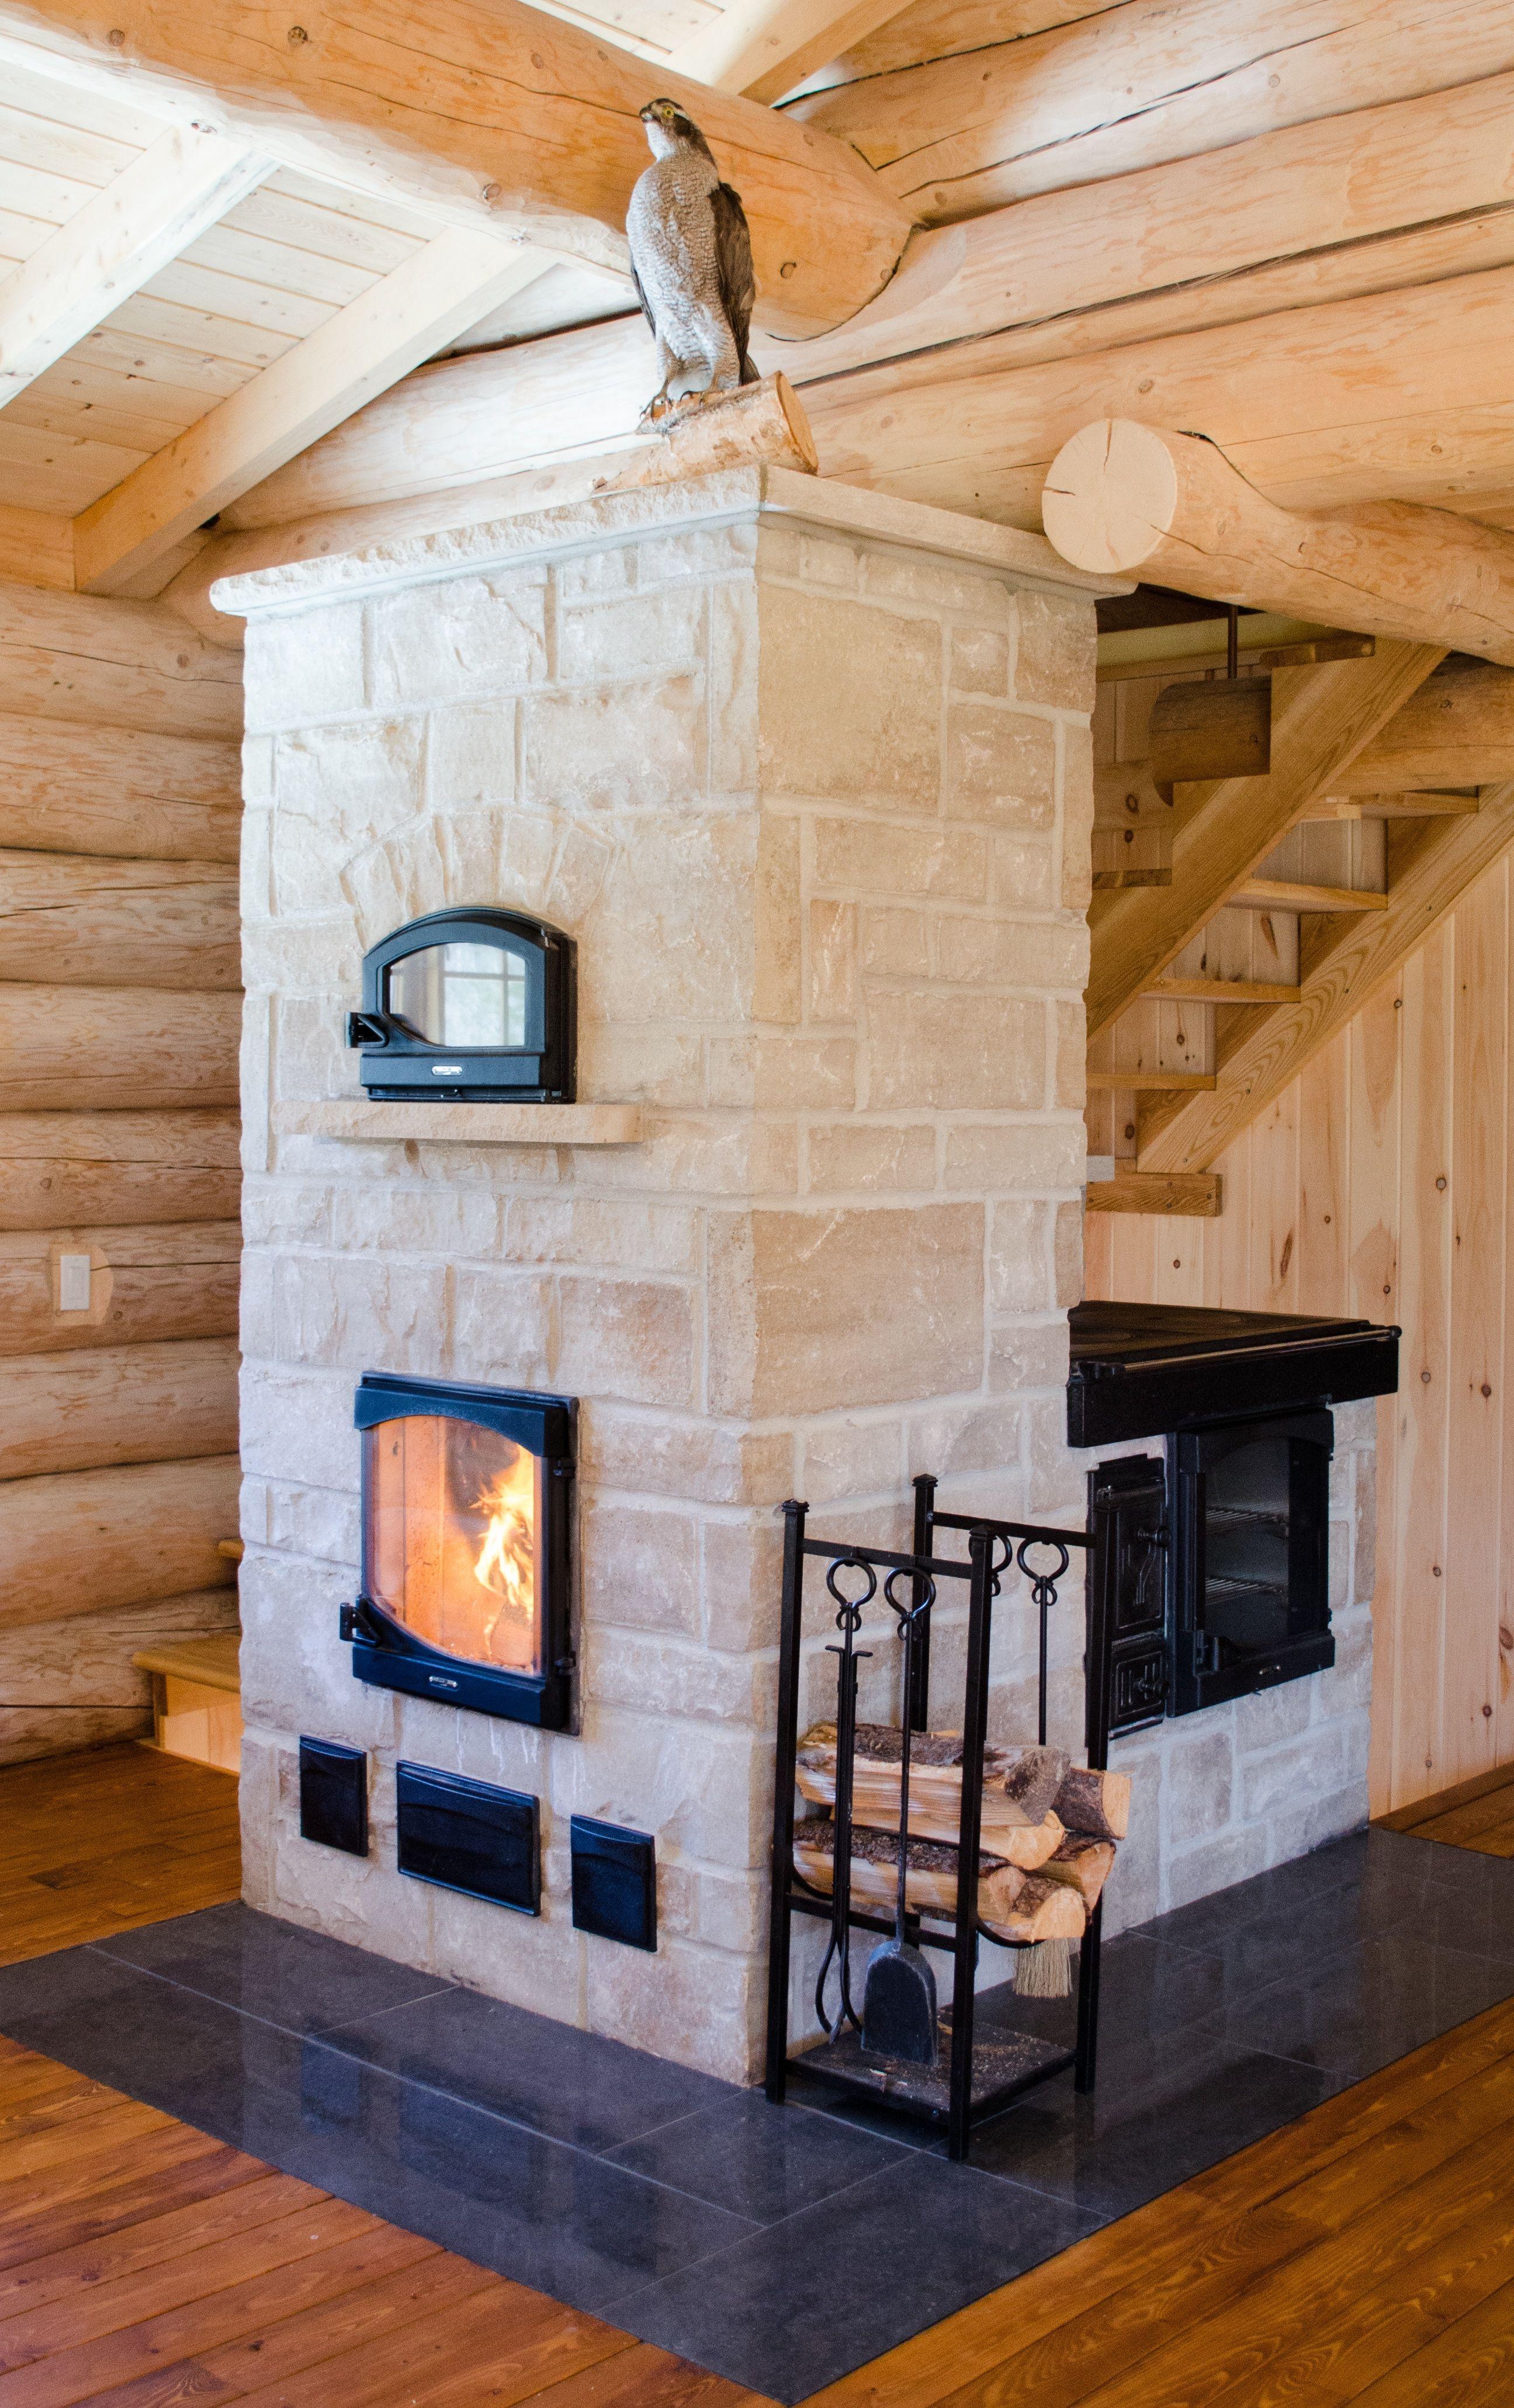 Feuvert Masonry Heater Masonry Heater In 2019 Wood